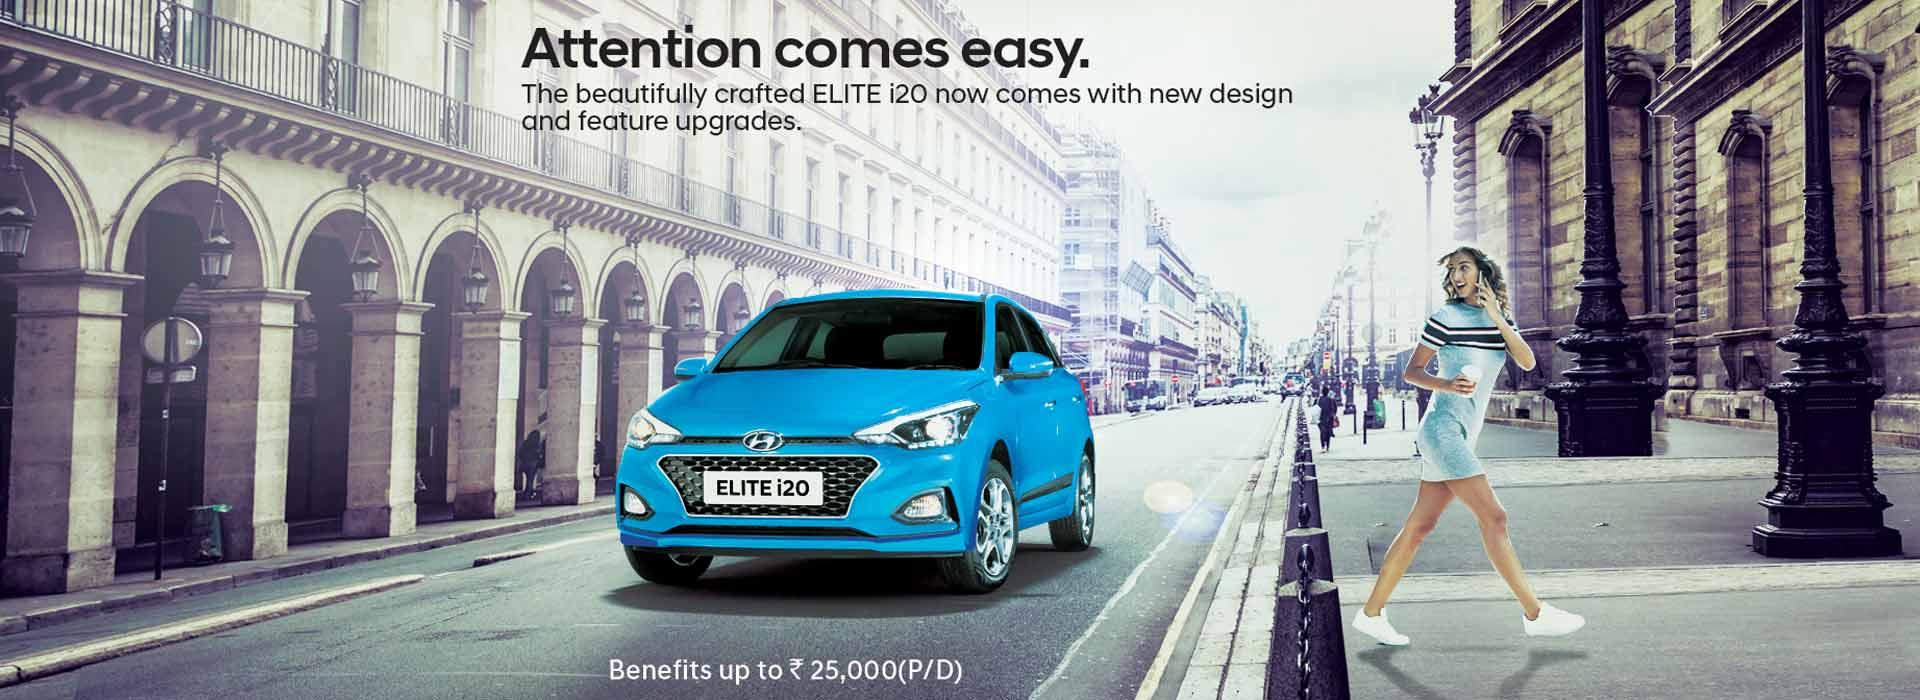 Kun Hyundai: Authorized new car dealership serving and